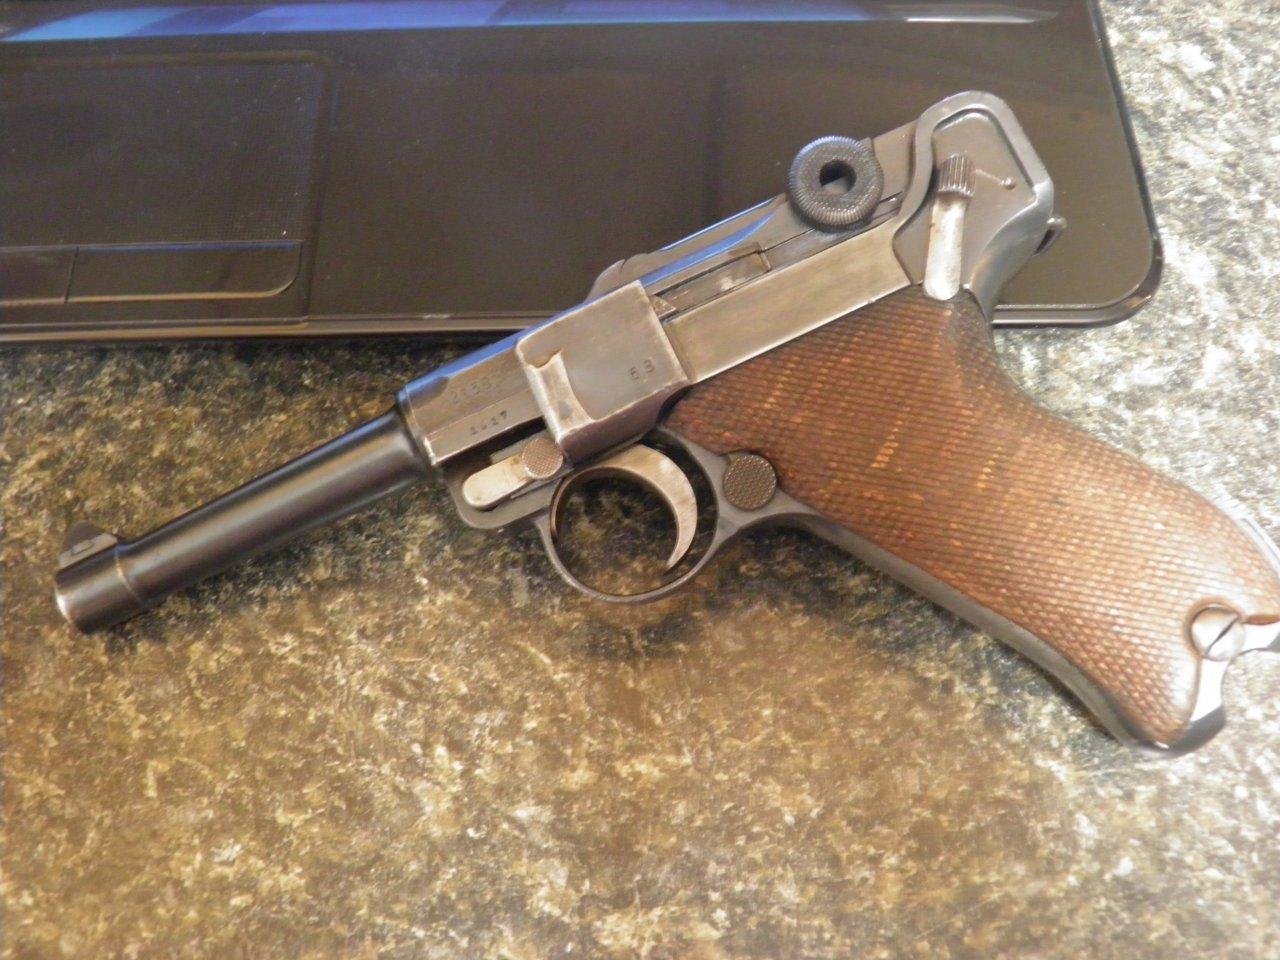 1917/1918 DWM Luger | Gun Values Board